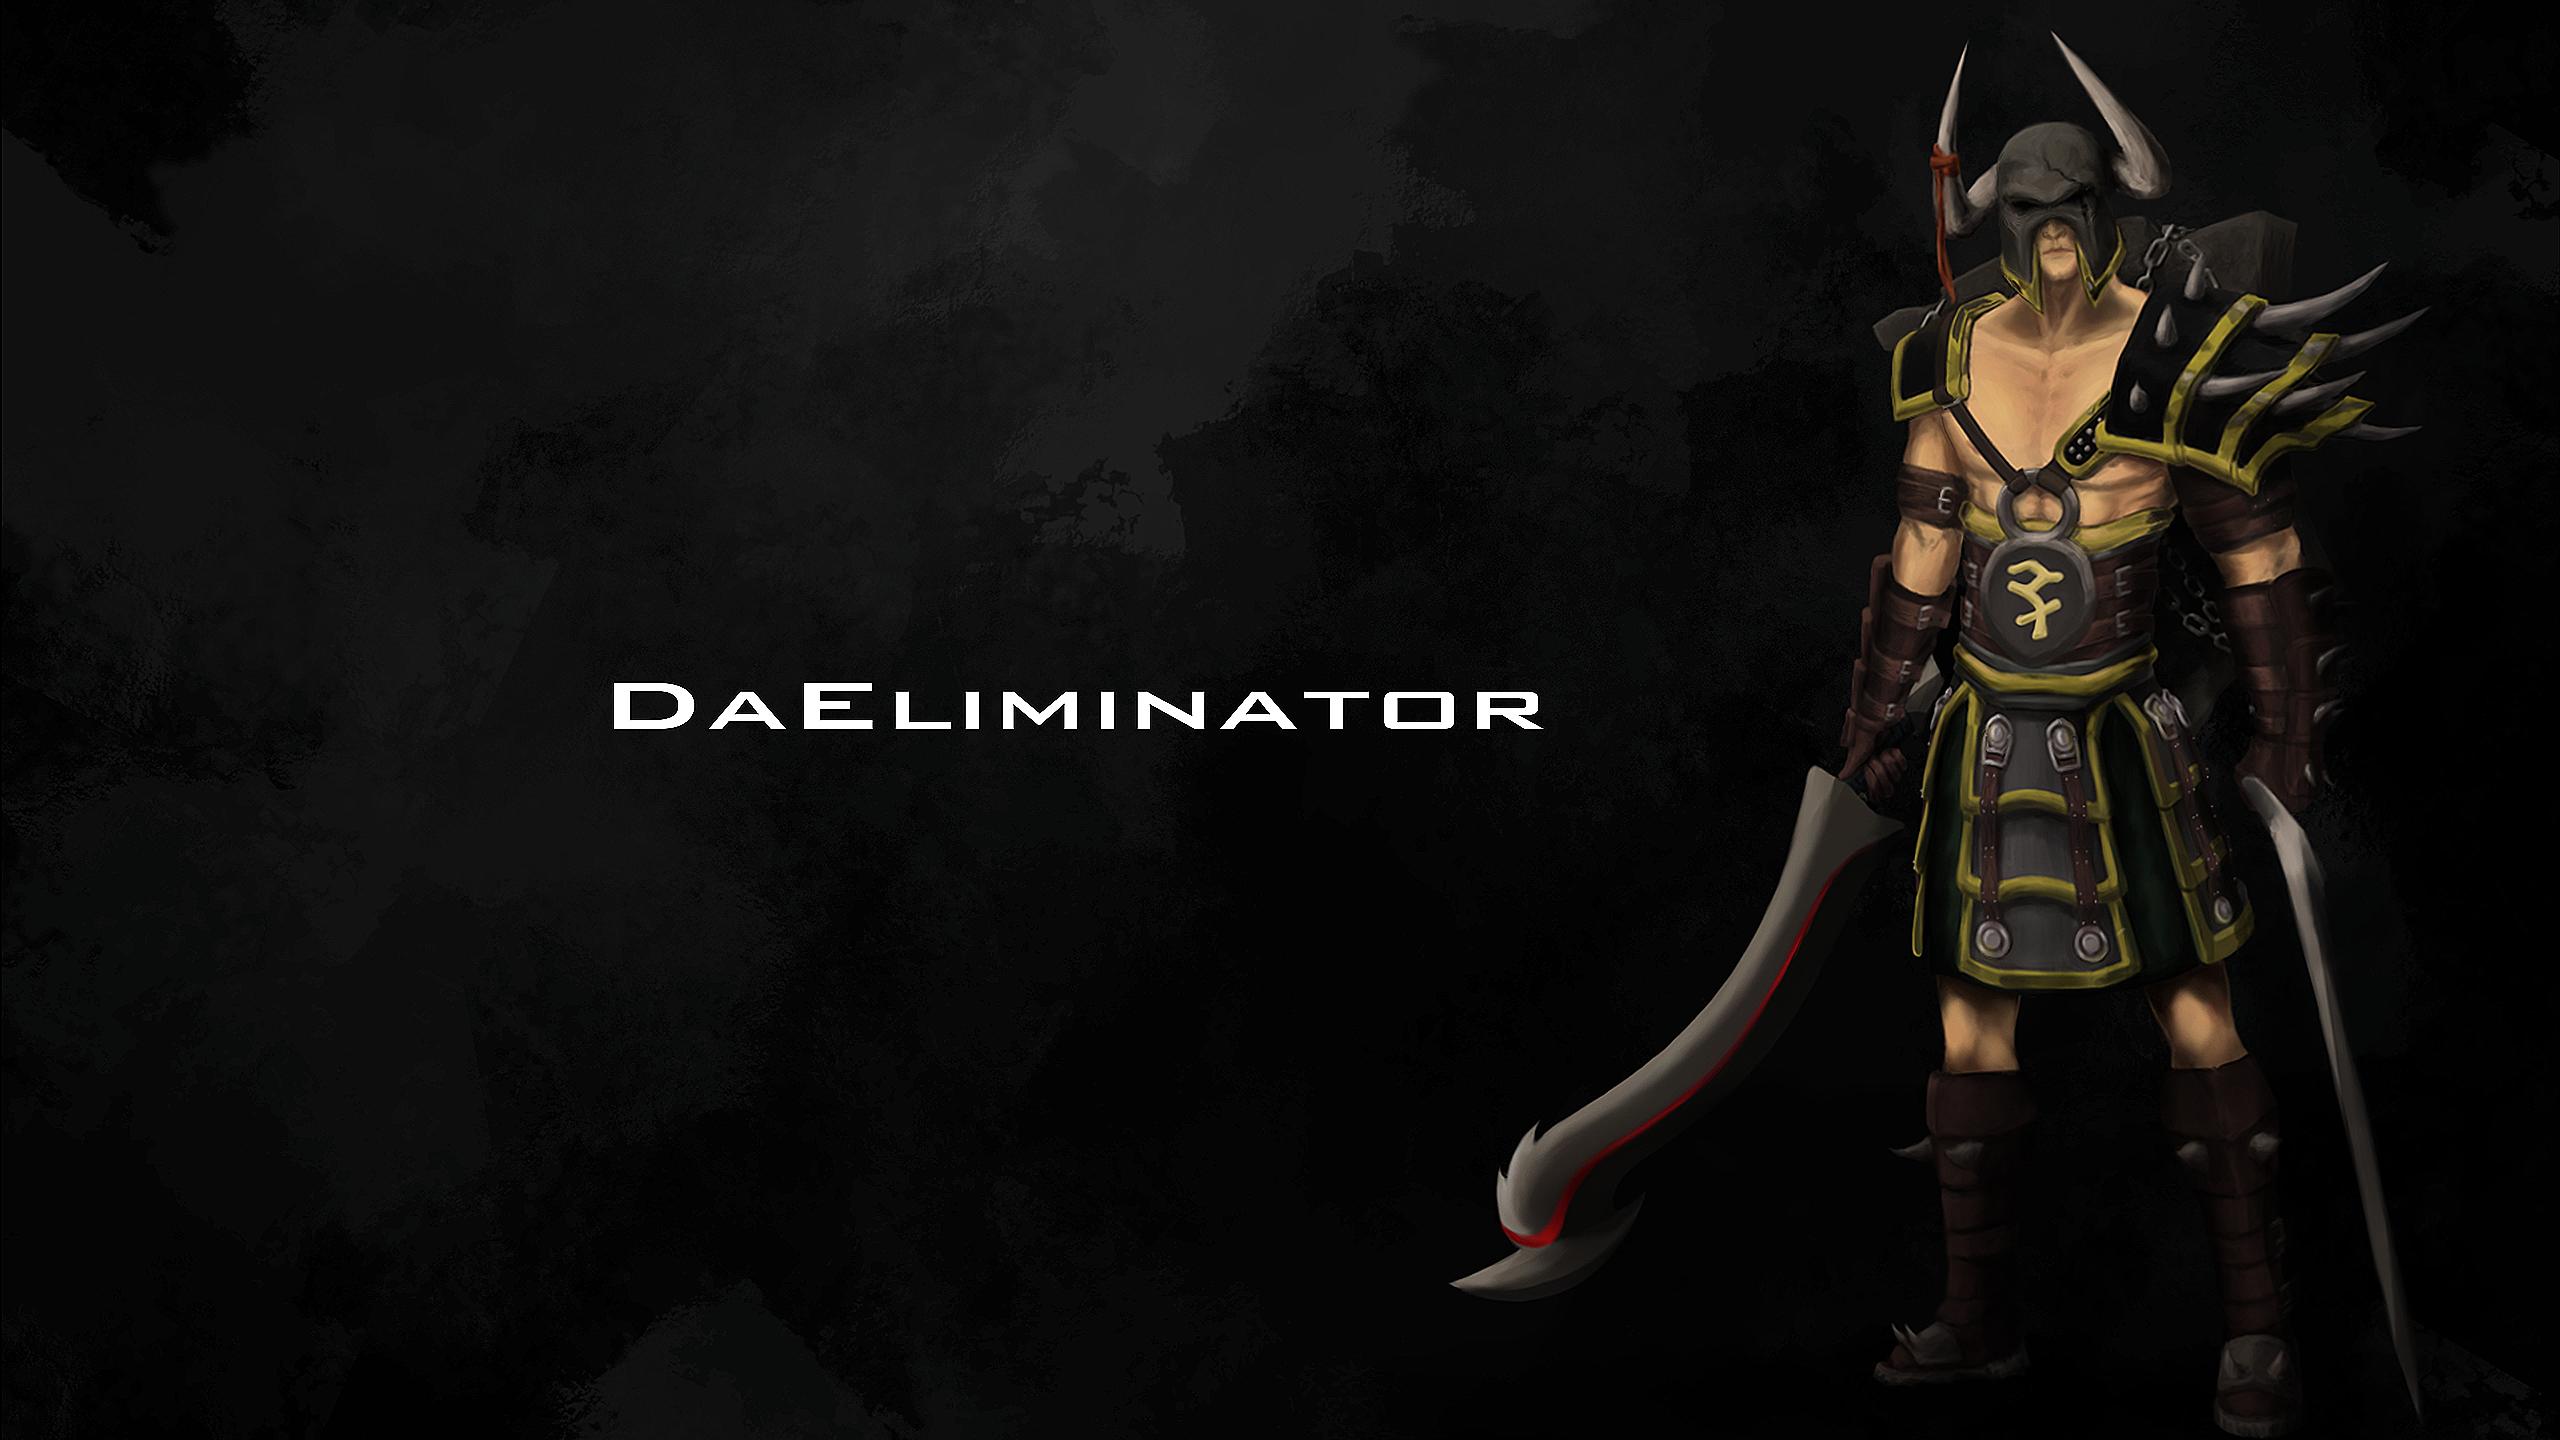 RuneScape EoC [Melee] Bandos Warrior by DaEliminator